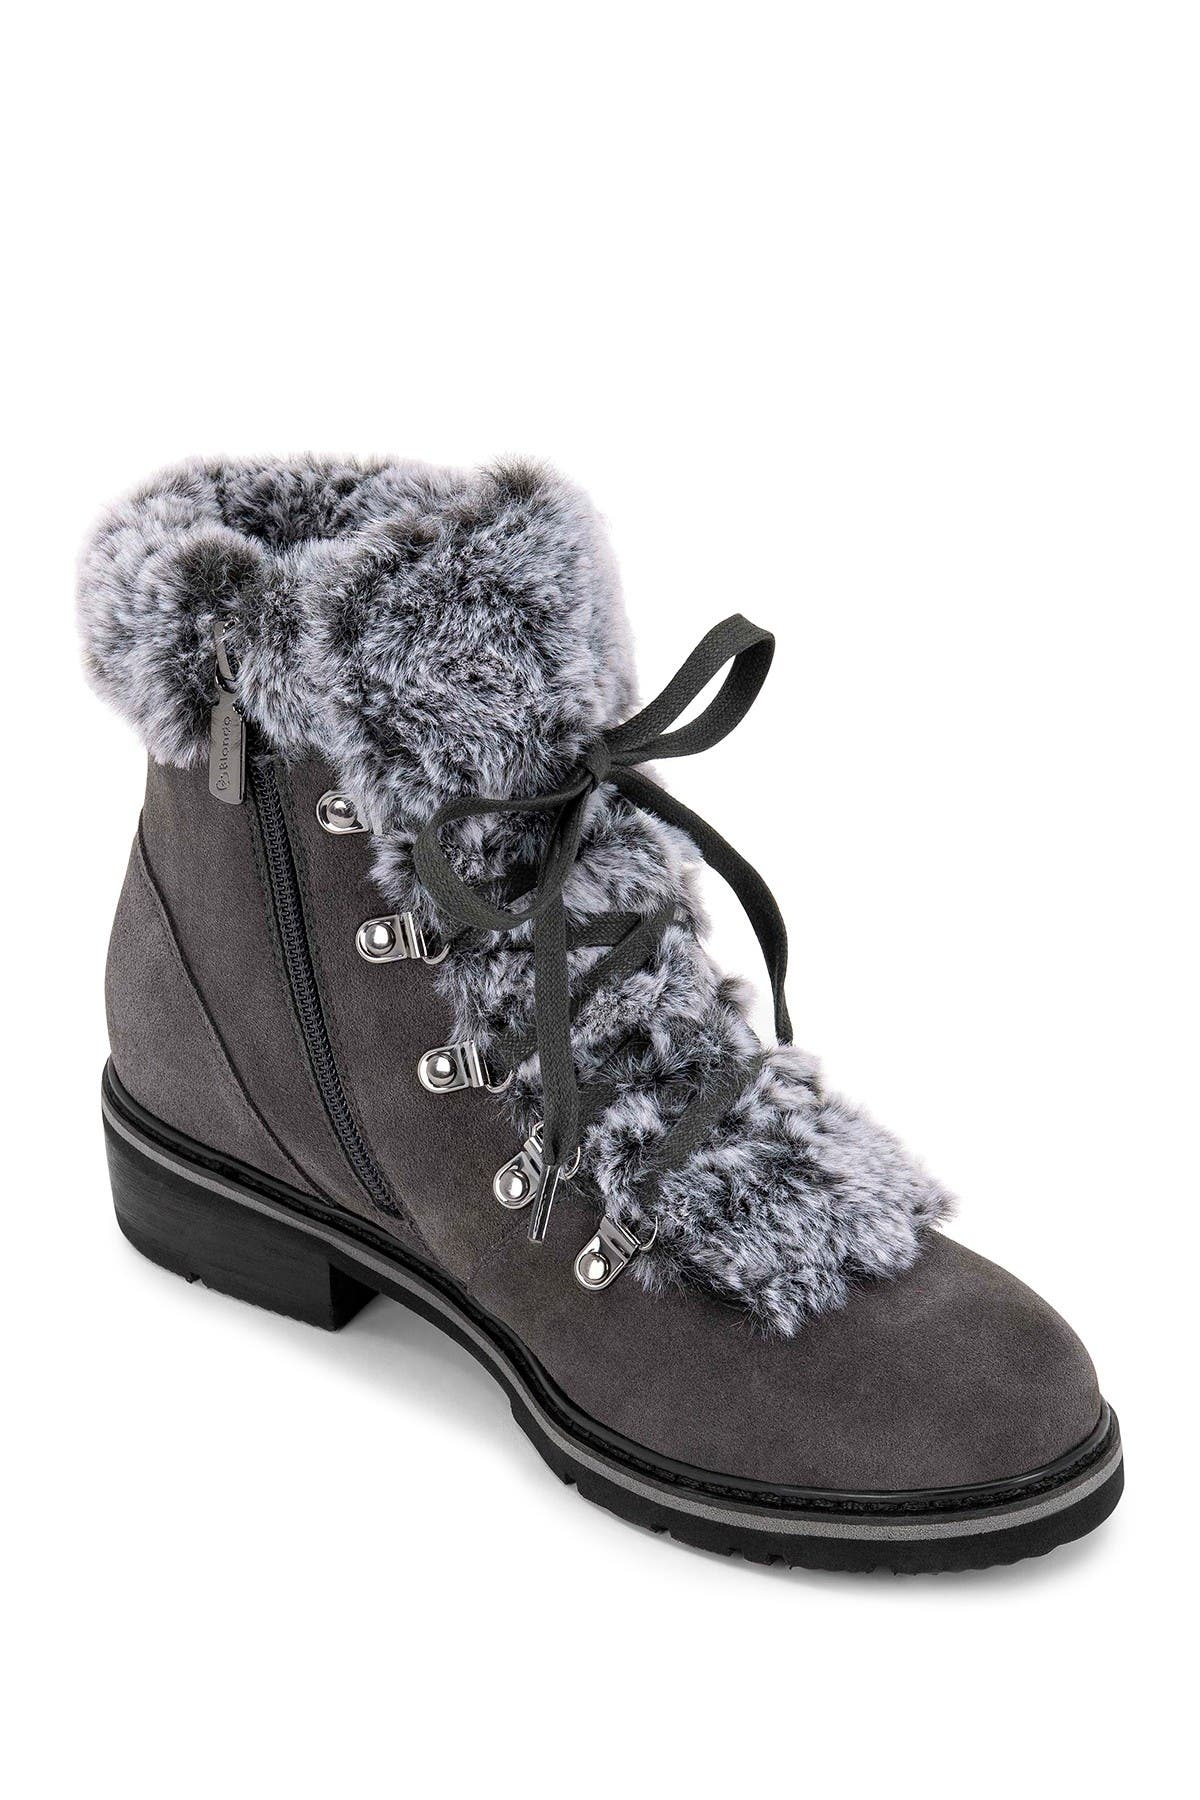 Image of Blondo Veer Waterproof Suede Faux Fur Lace-Up Boot